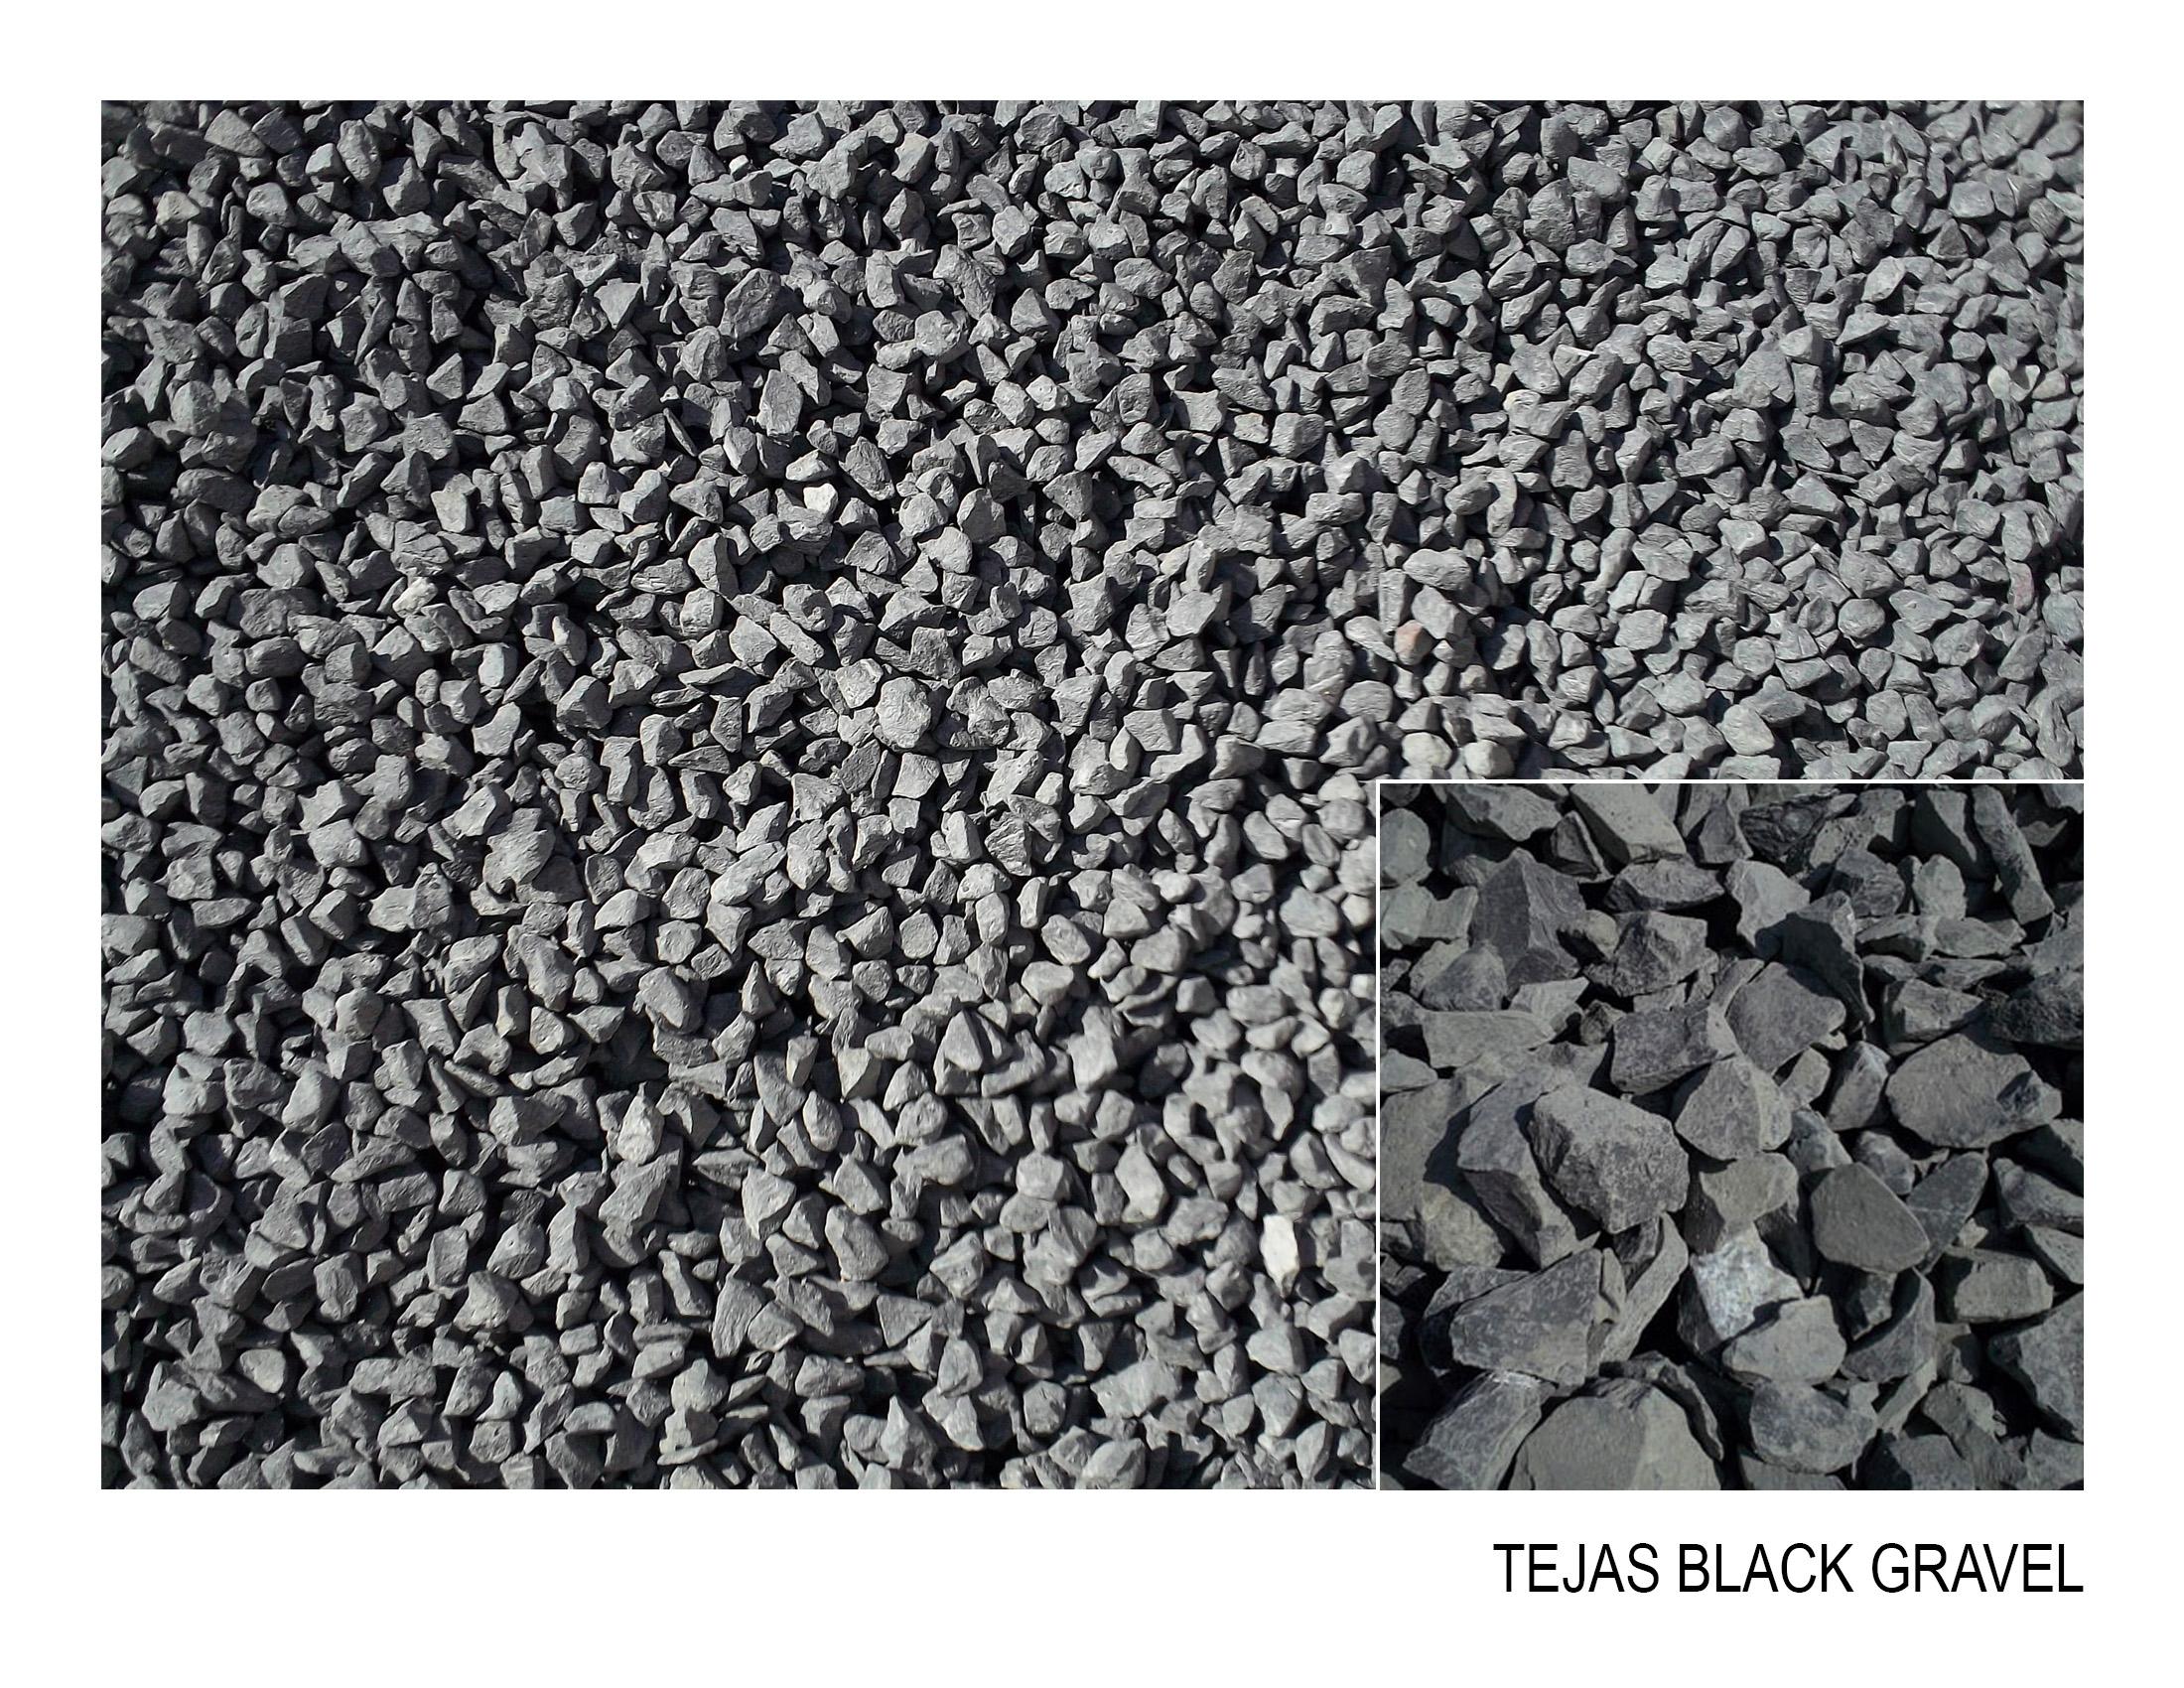 tejas black gravel.jpg